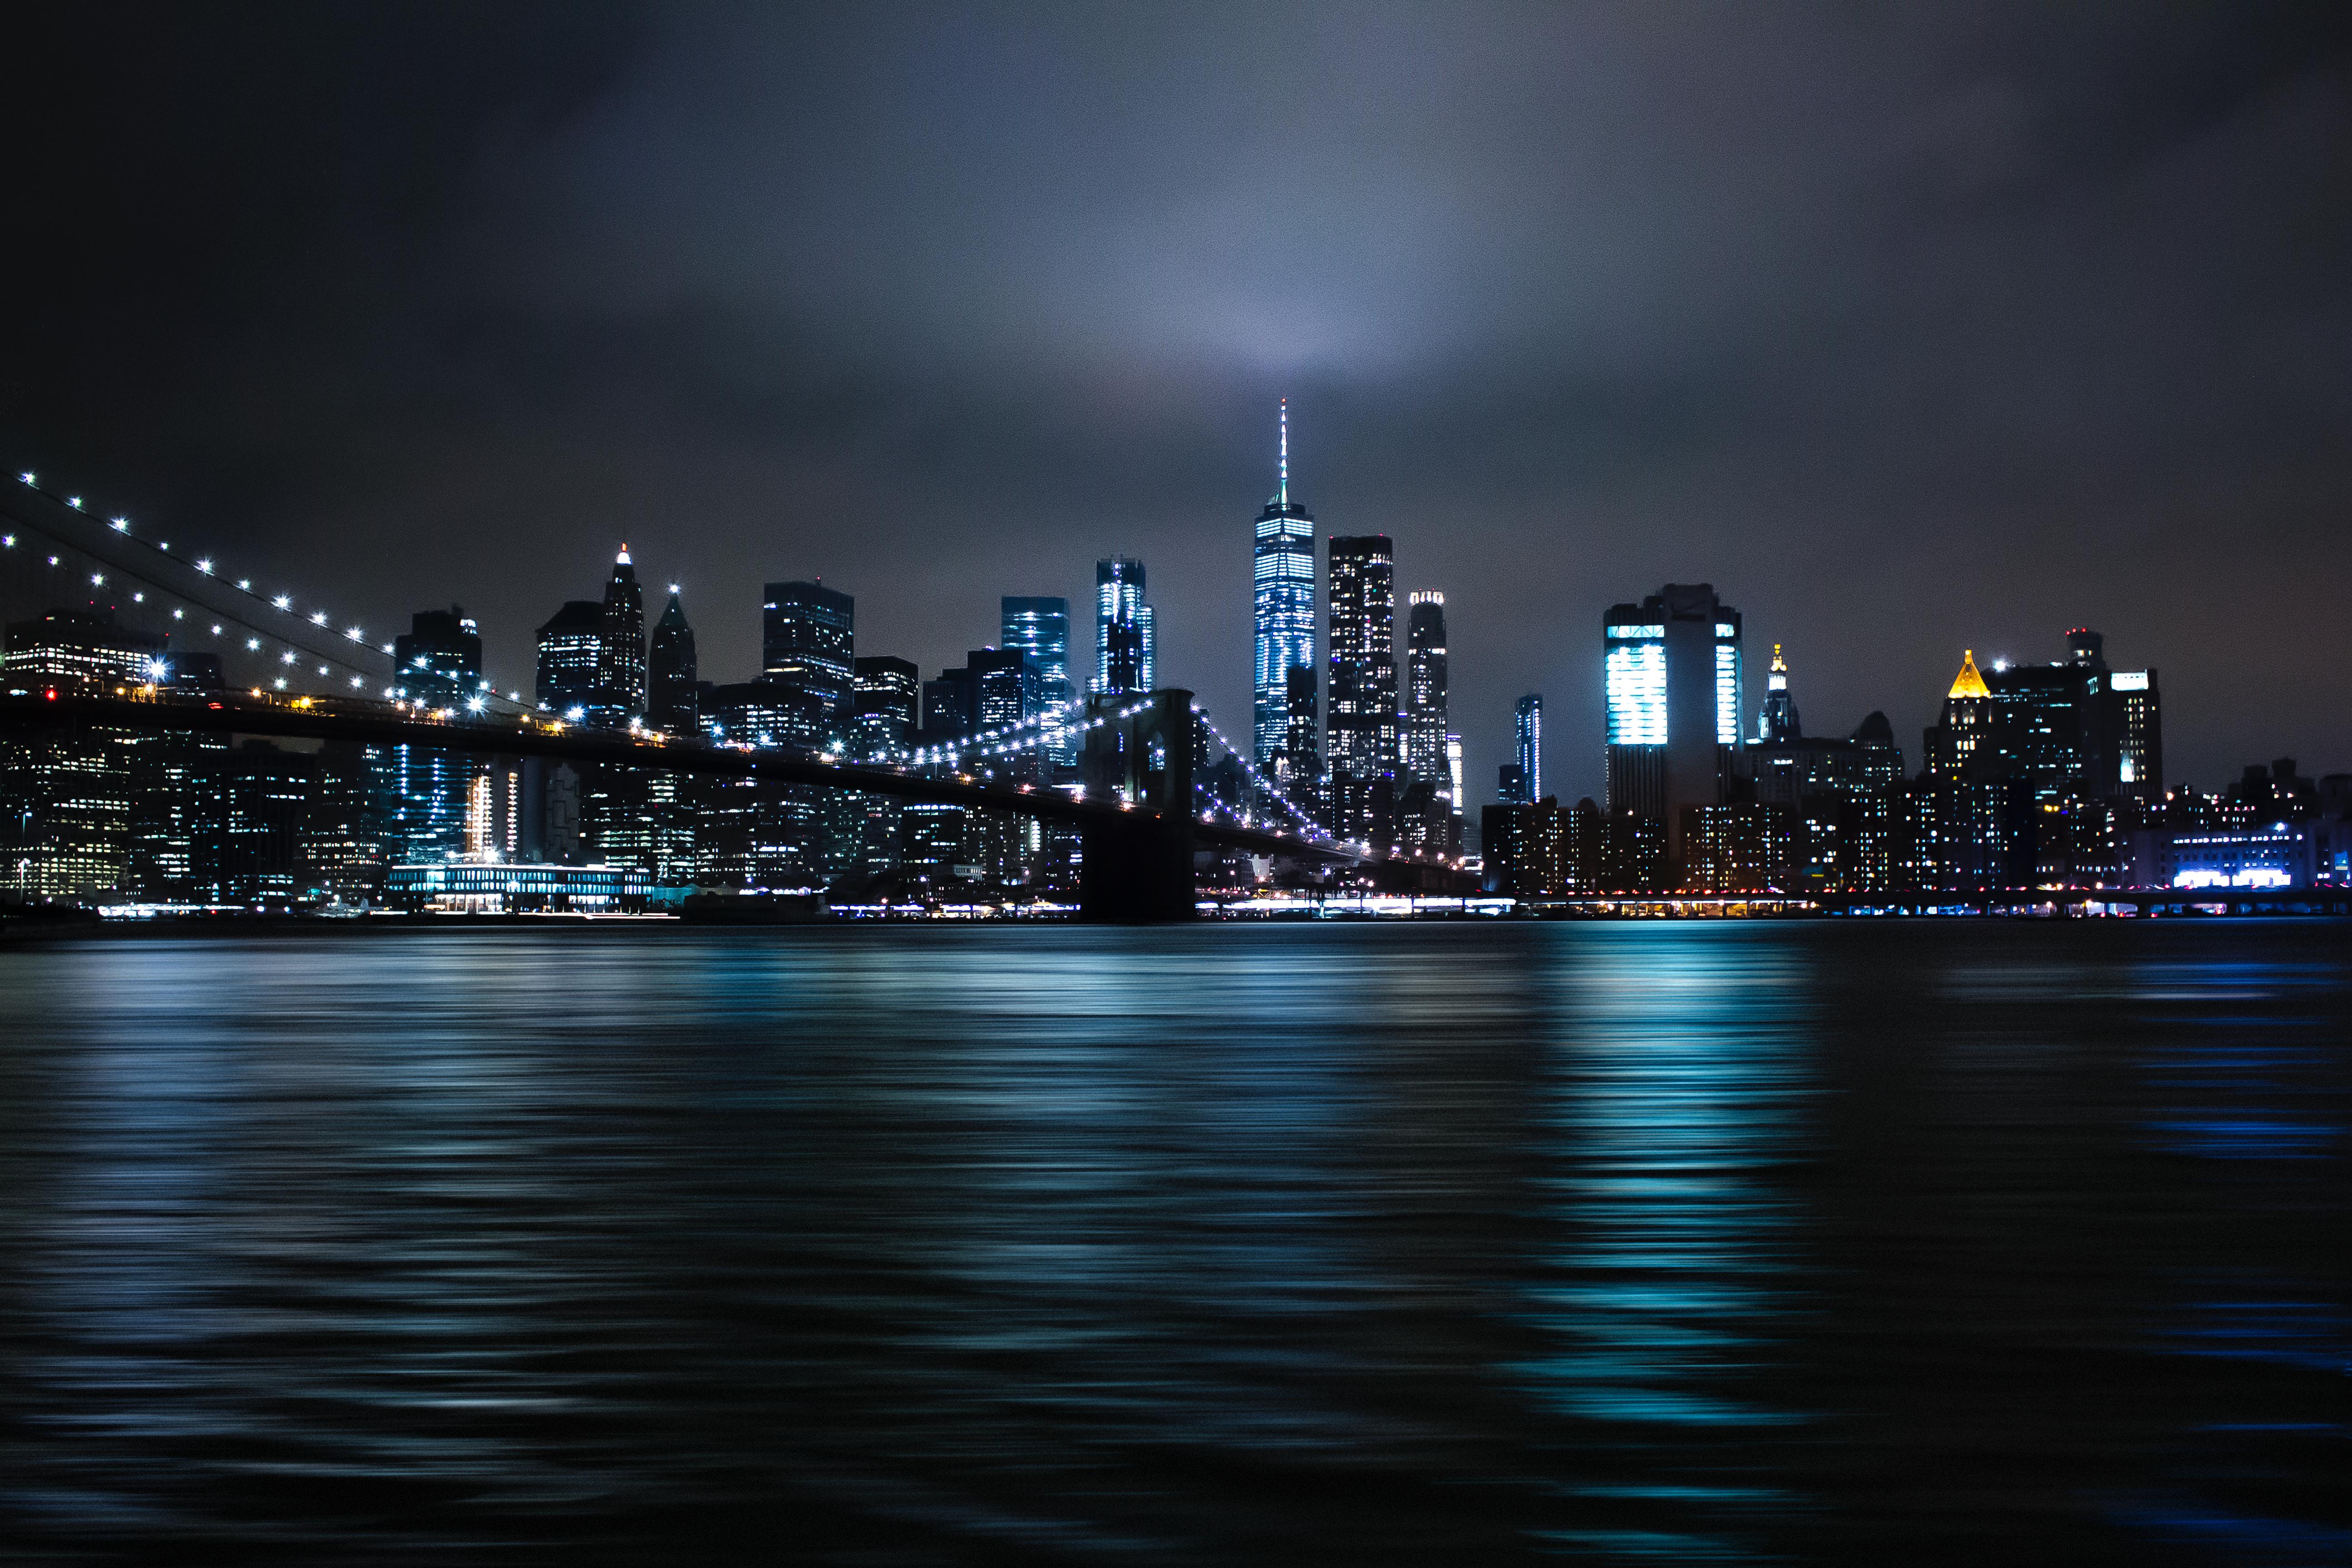 New York City At Night Wallpaper 5184x3456 Download Hd Wallpaper Wallpapertip